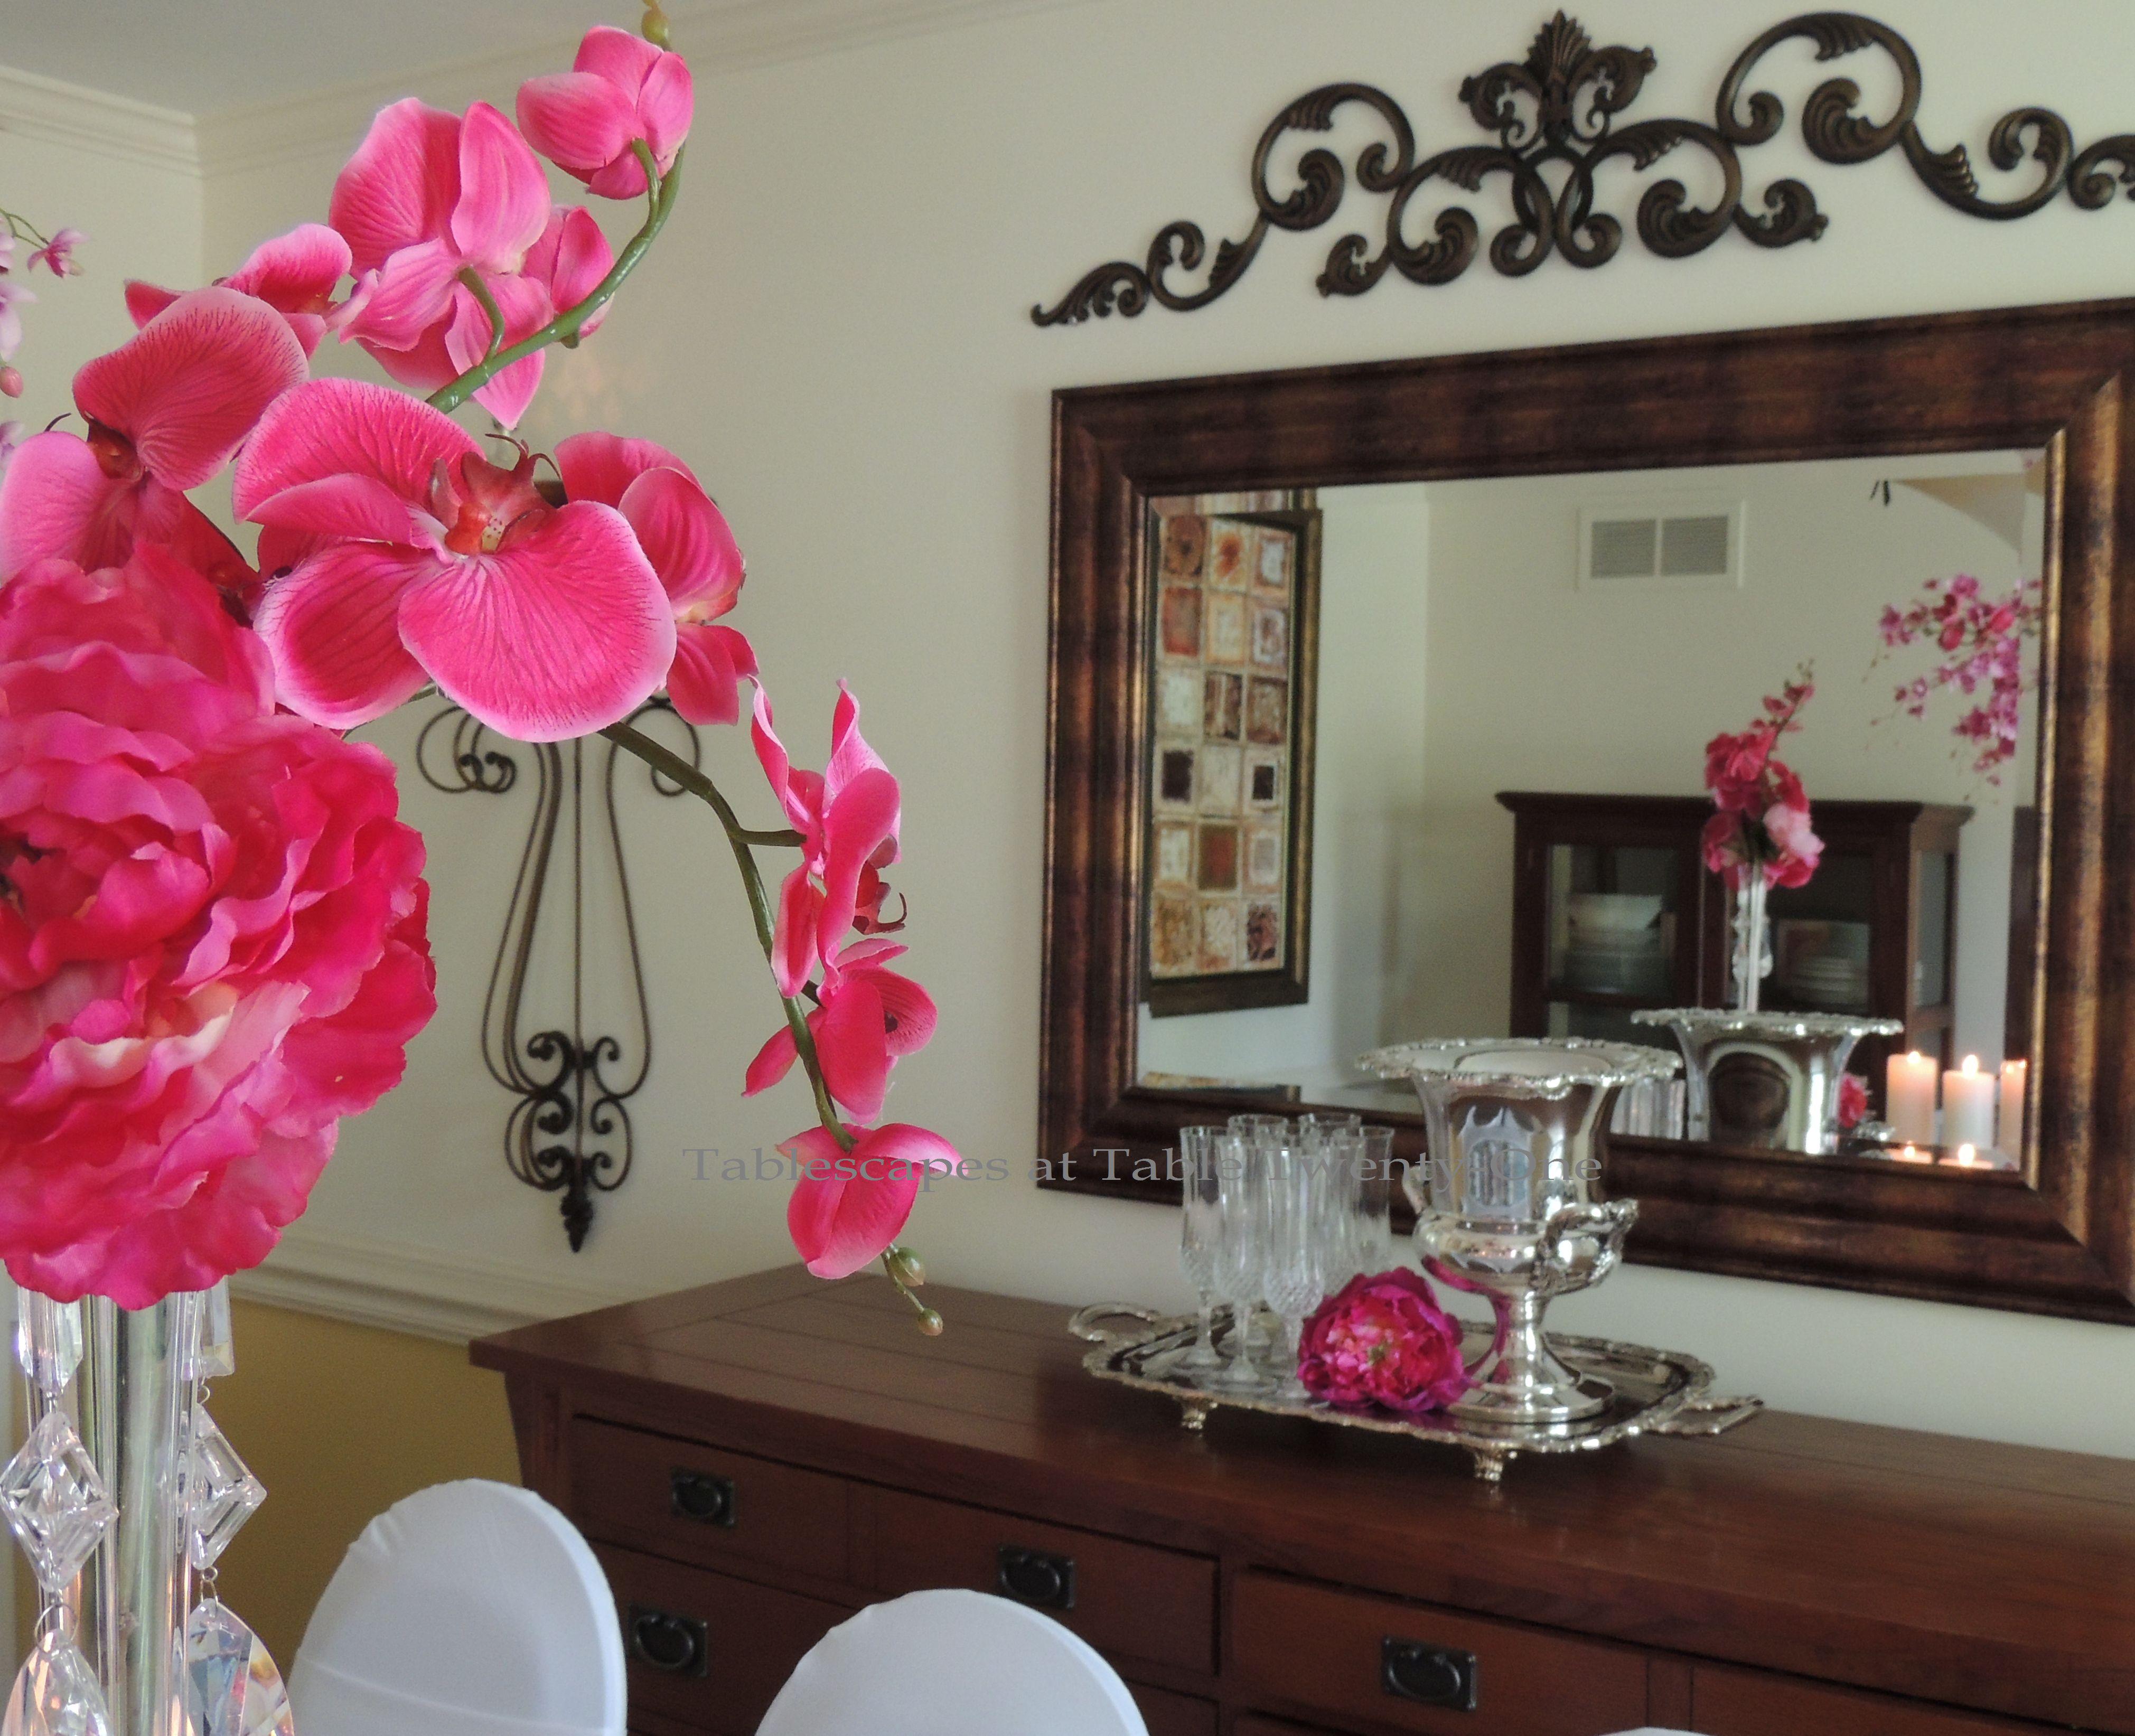 Tablescapes at Table Twenty-One, www.tabletwentyone.wordpress.com: My Sister's Wedding China - Buffet table